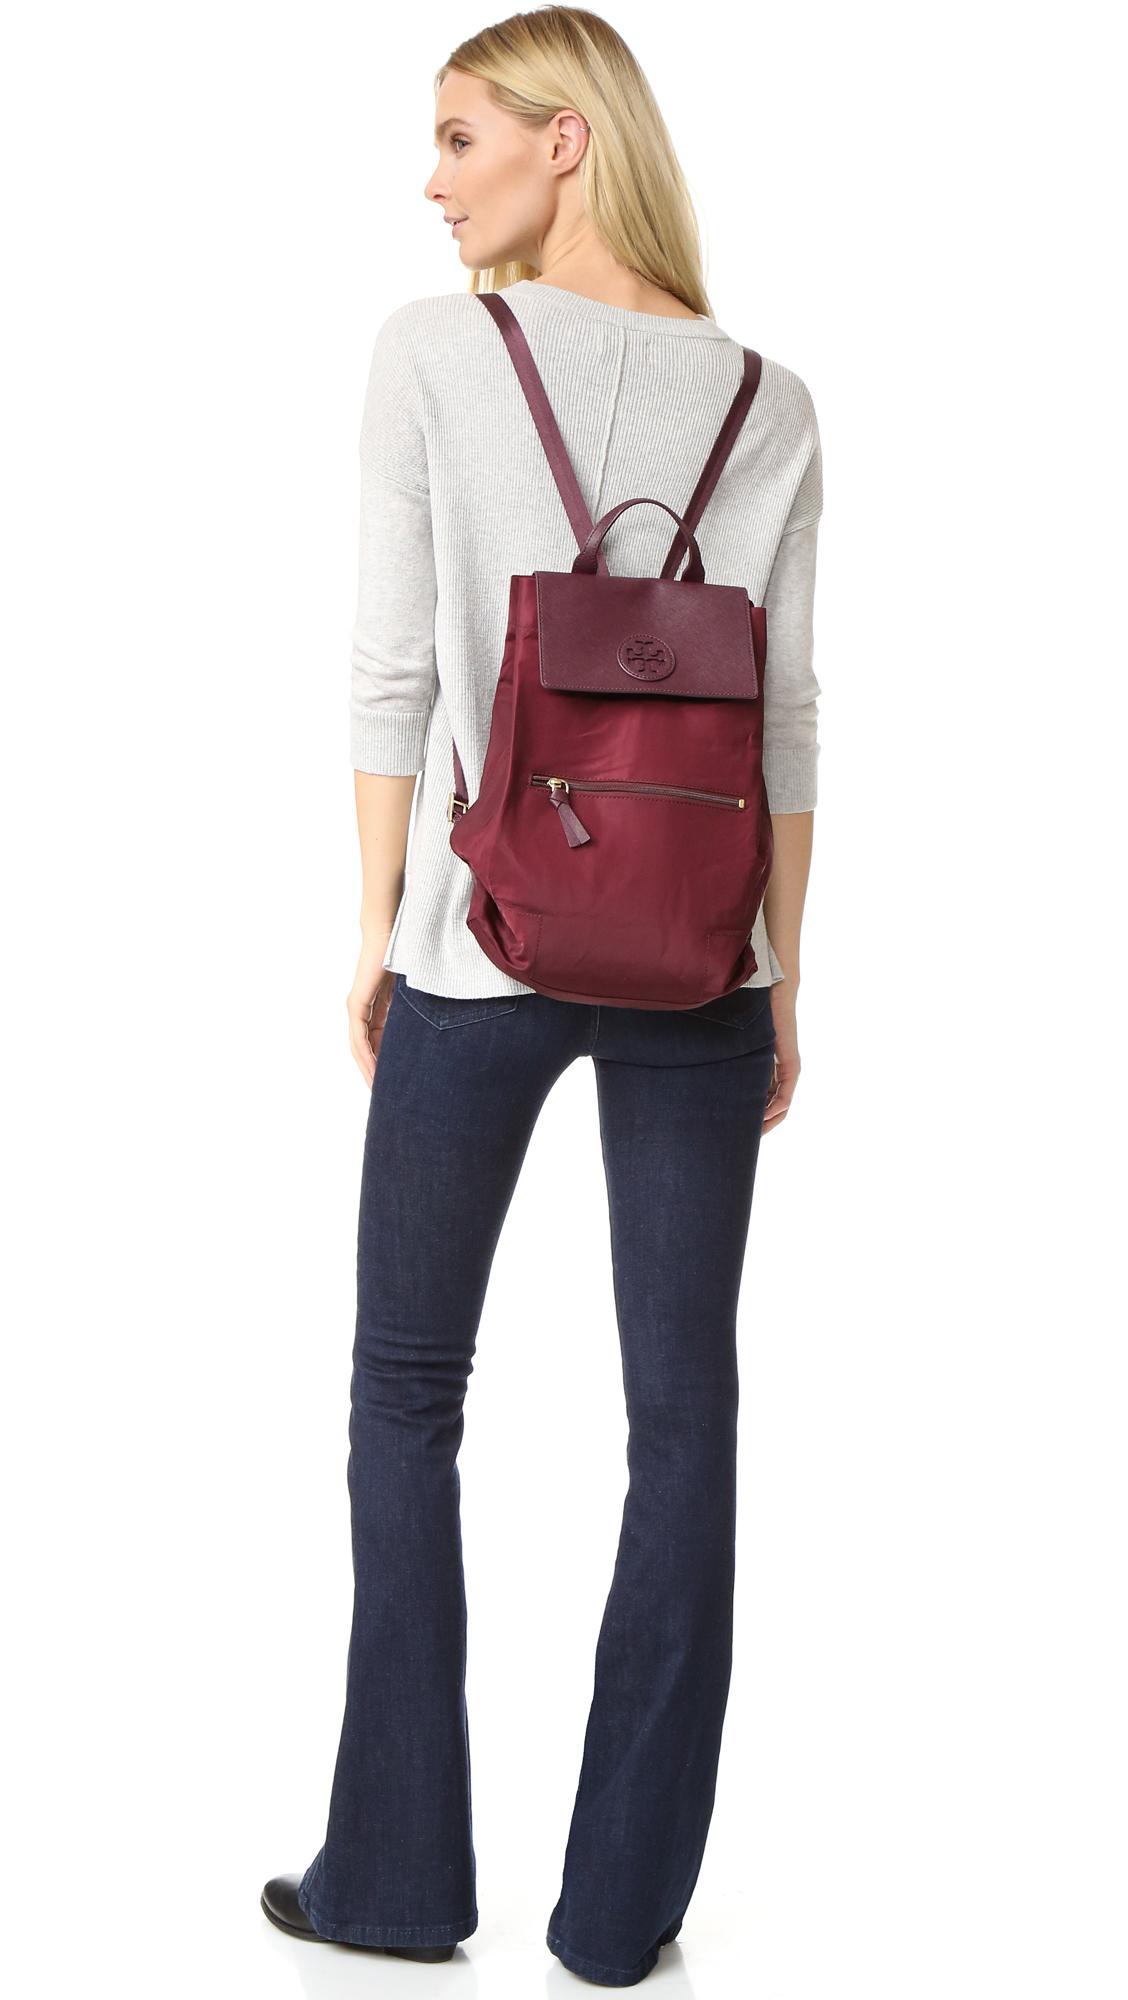 be30be40ef94 Tory Burch Ella Packable Backpack